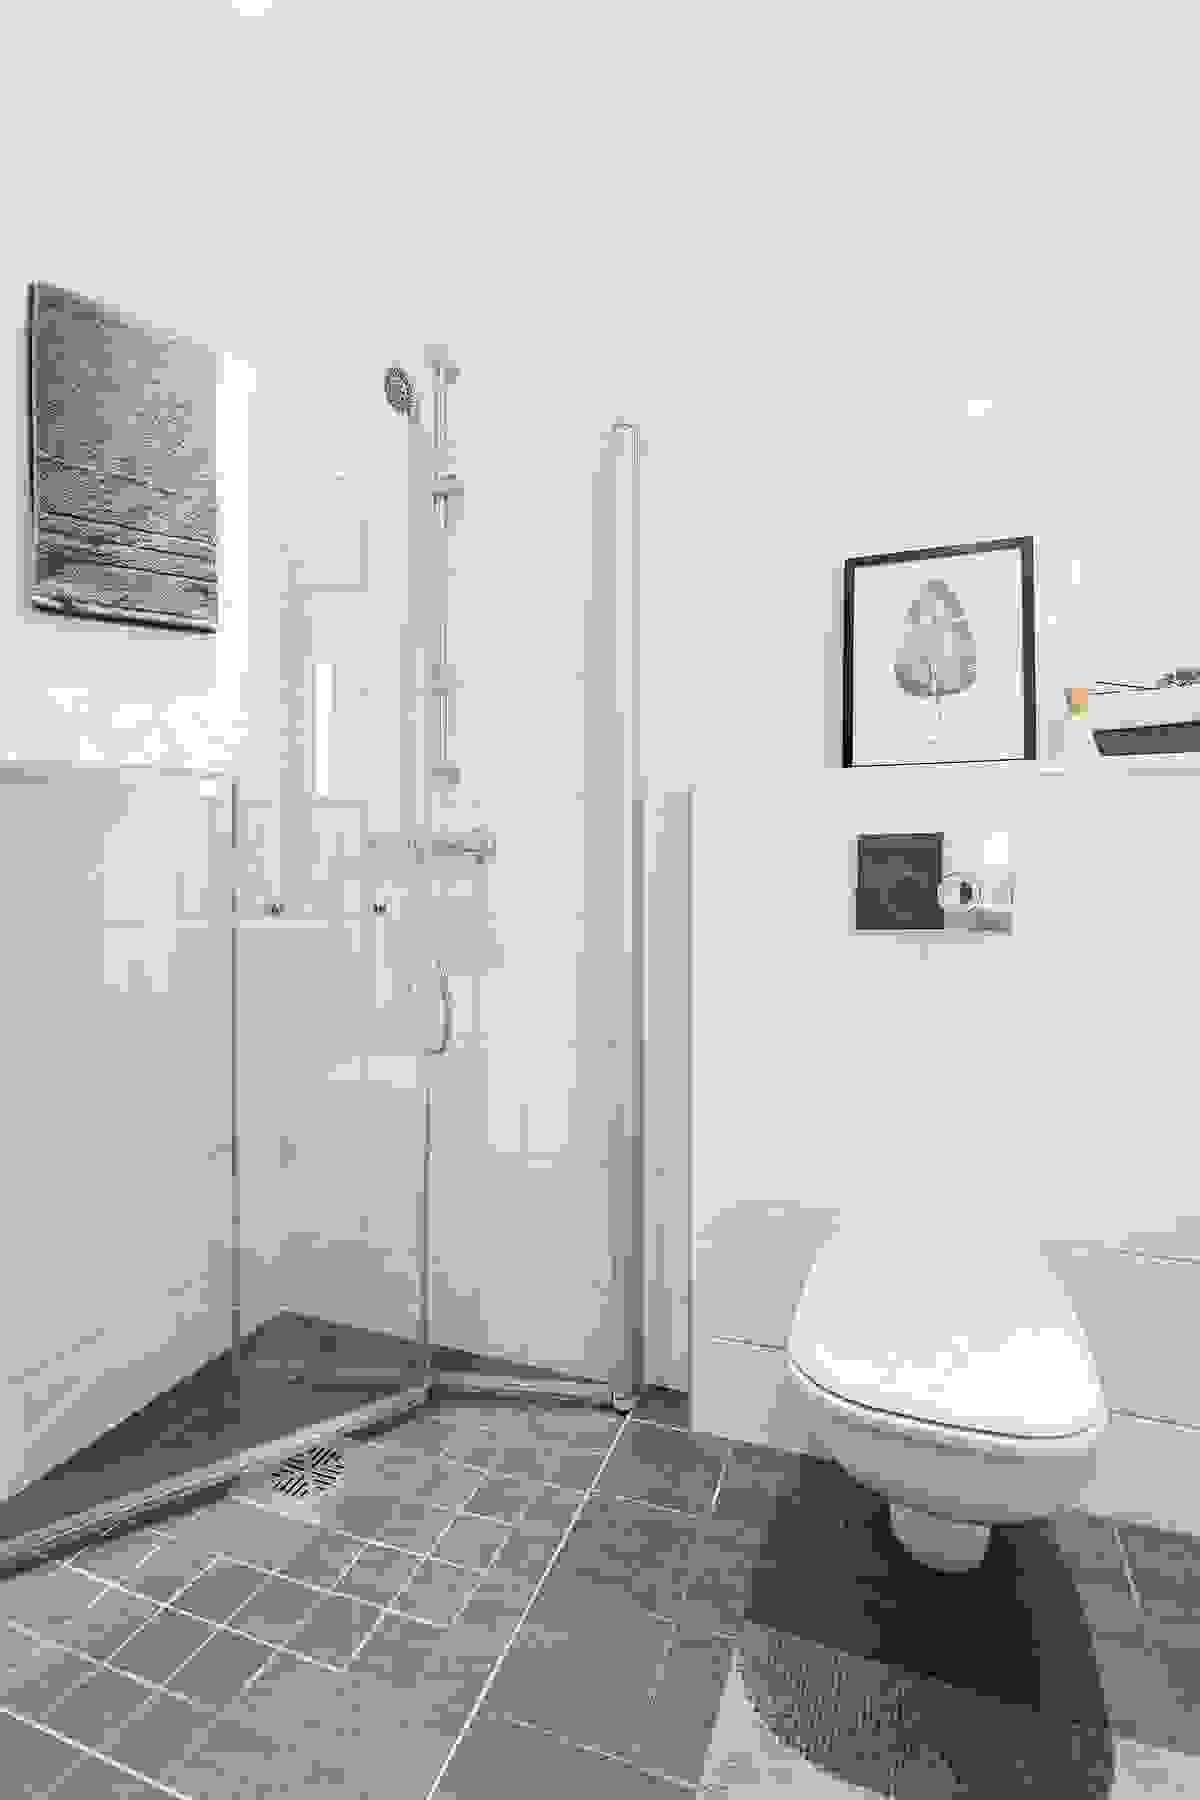 Et moderne bad skal også ha god lyssetting. Begge baderommene leveres derfor med innfelte downlights med nivåjustering